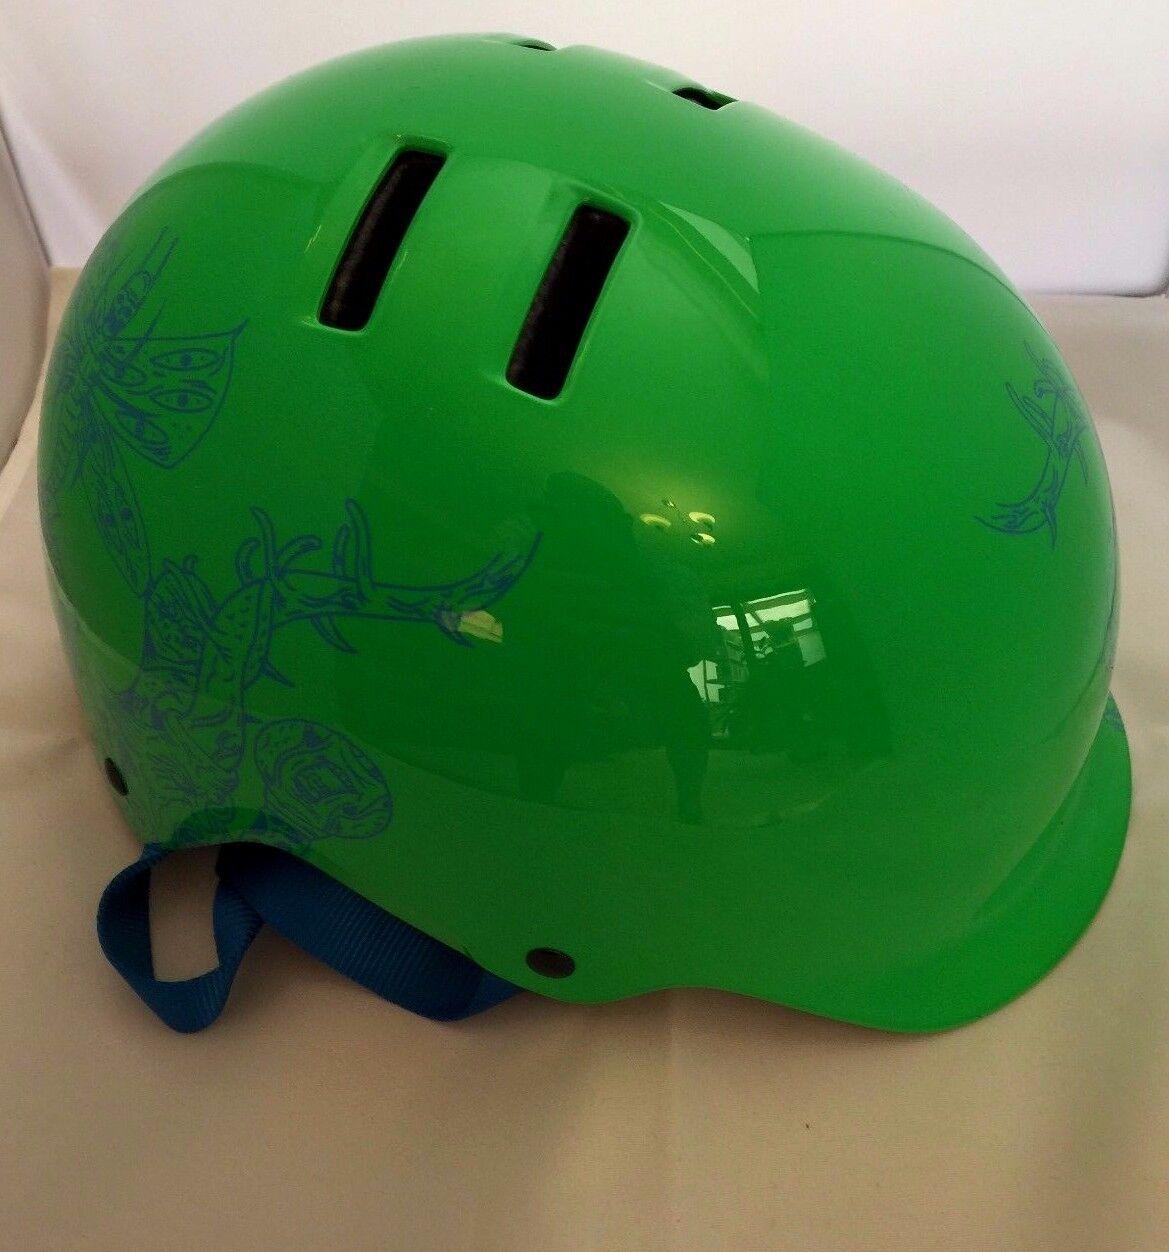 Giro Surface Small Green Cycling Helmet